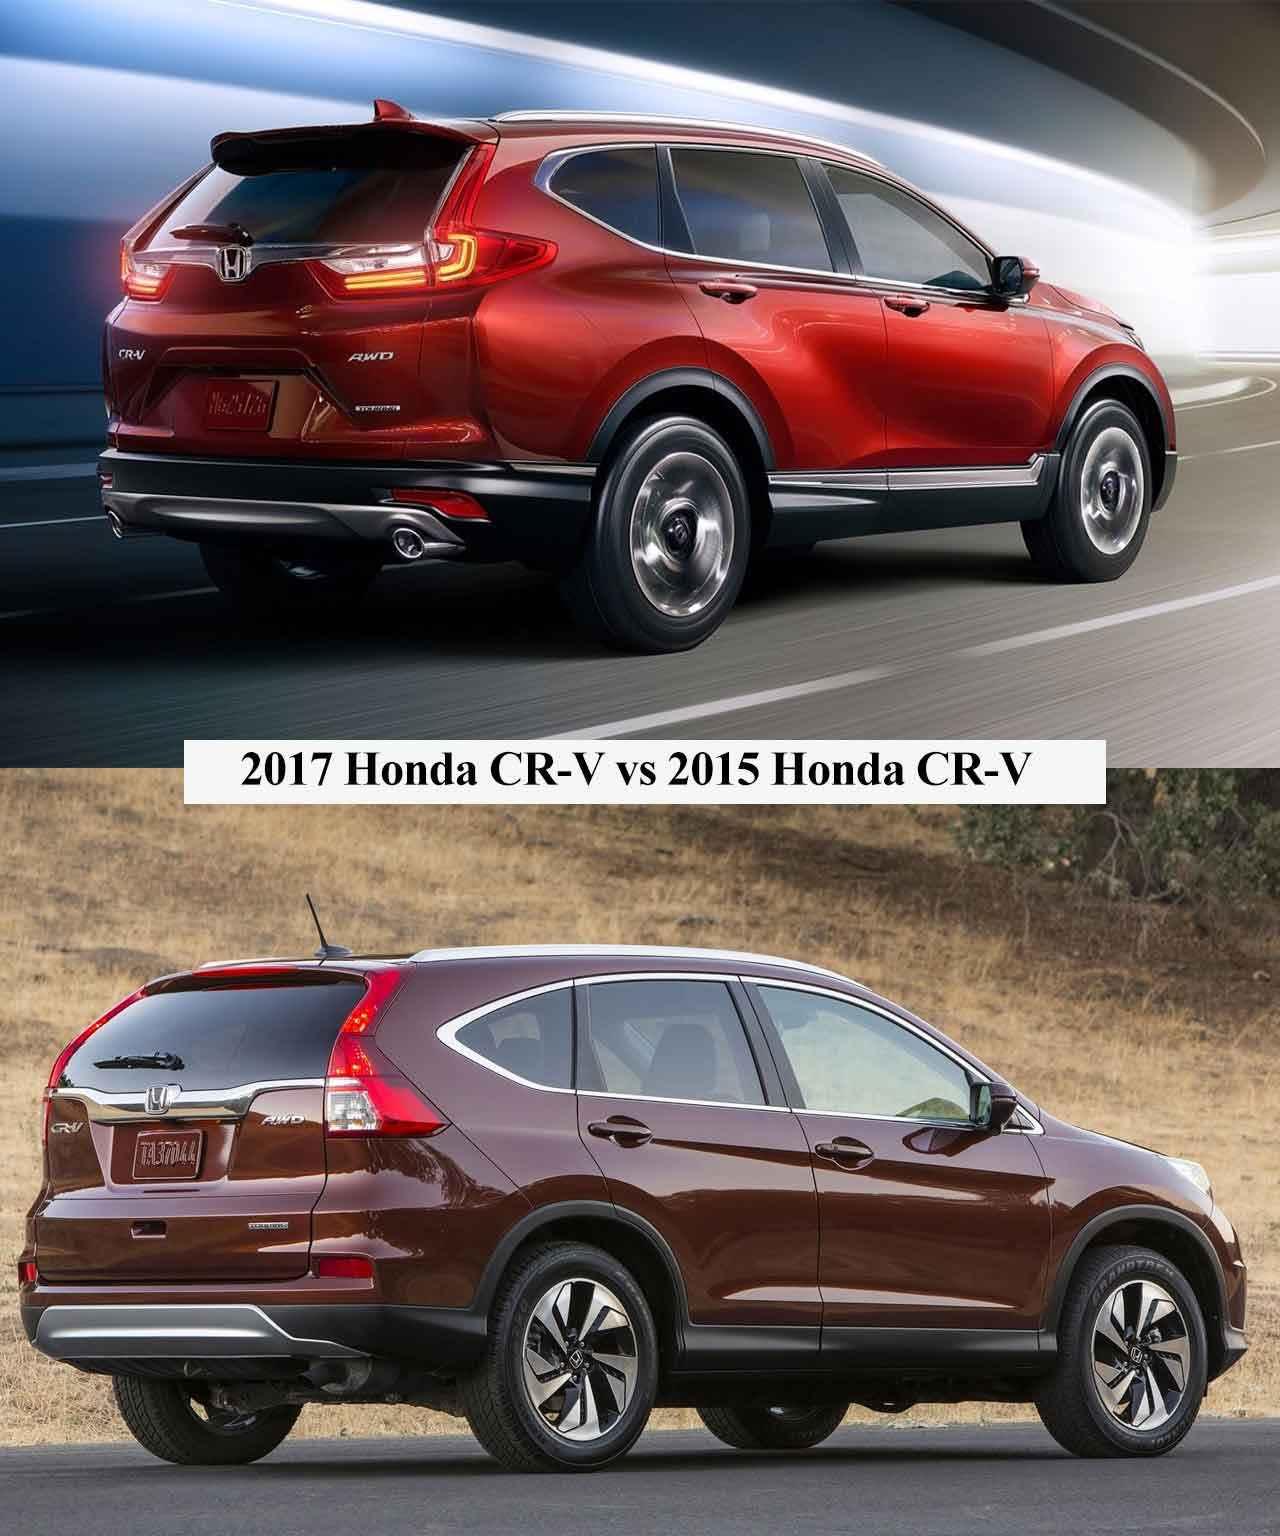 Honda Hrv Vs Crv >> 2017 Honda CR-V vs 2015 Honda CR-V Farkları-Karşılaştırma - YeniModelArabalar.com